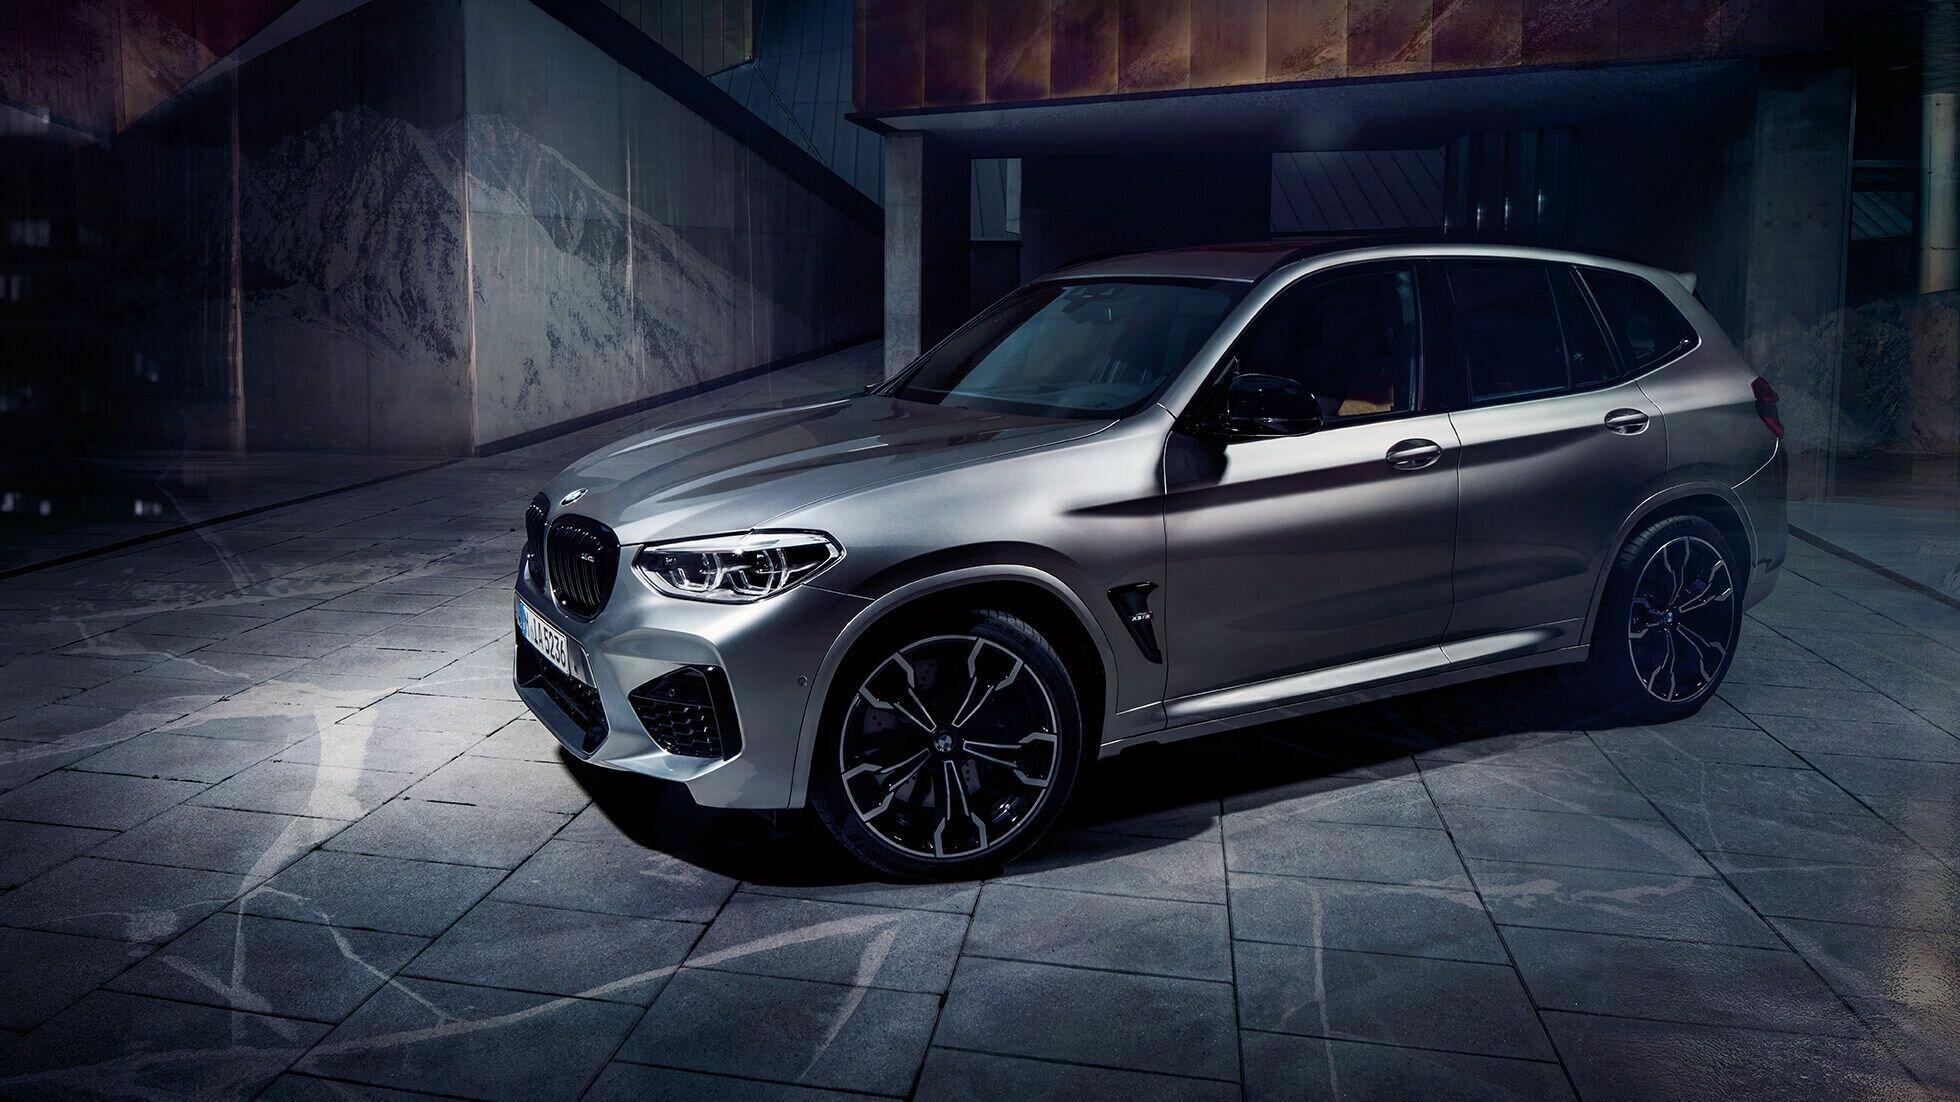 BMW X3 M Competition разгоняется до 96 км/ч за 3,3 секунды